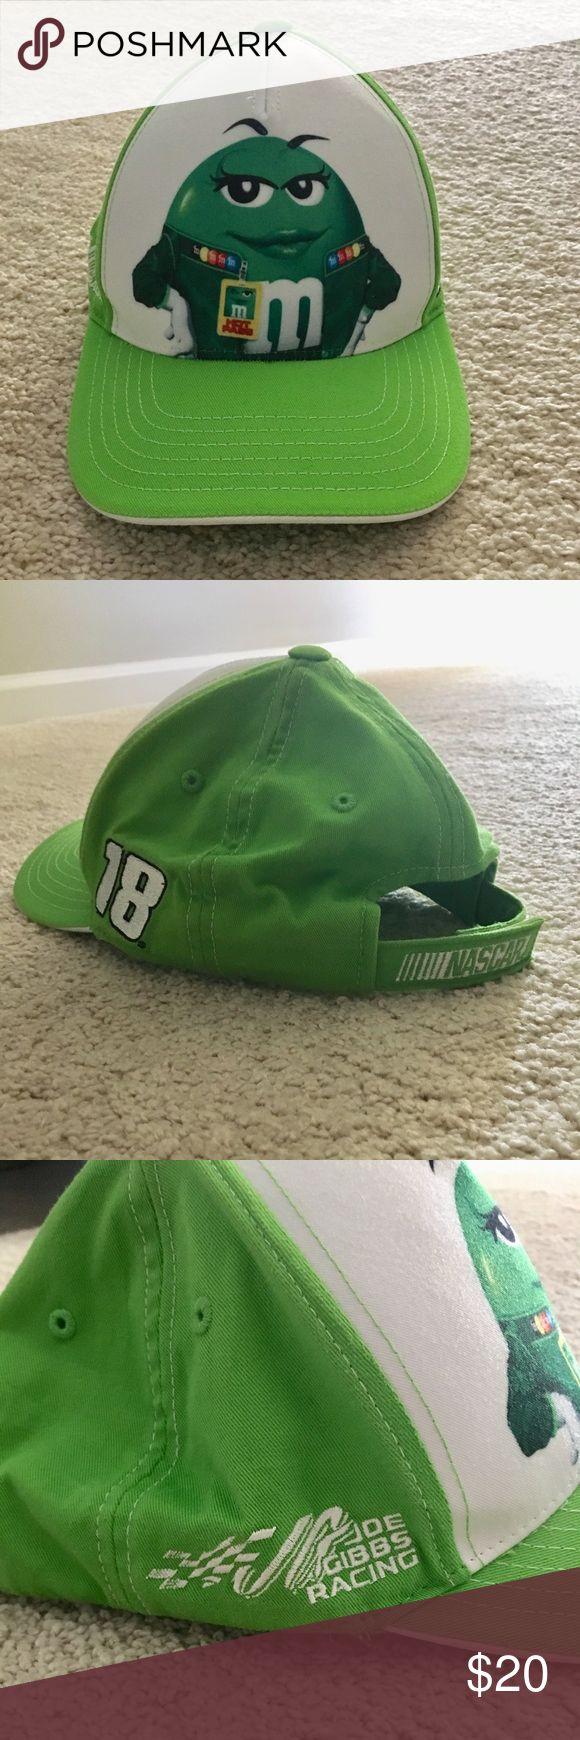 M&Ms Nascar Hat Green M&M's Nascar Hat Kyle Busch #18 Accessories Hats